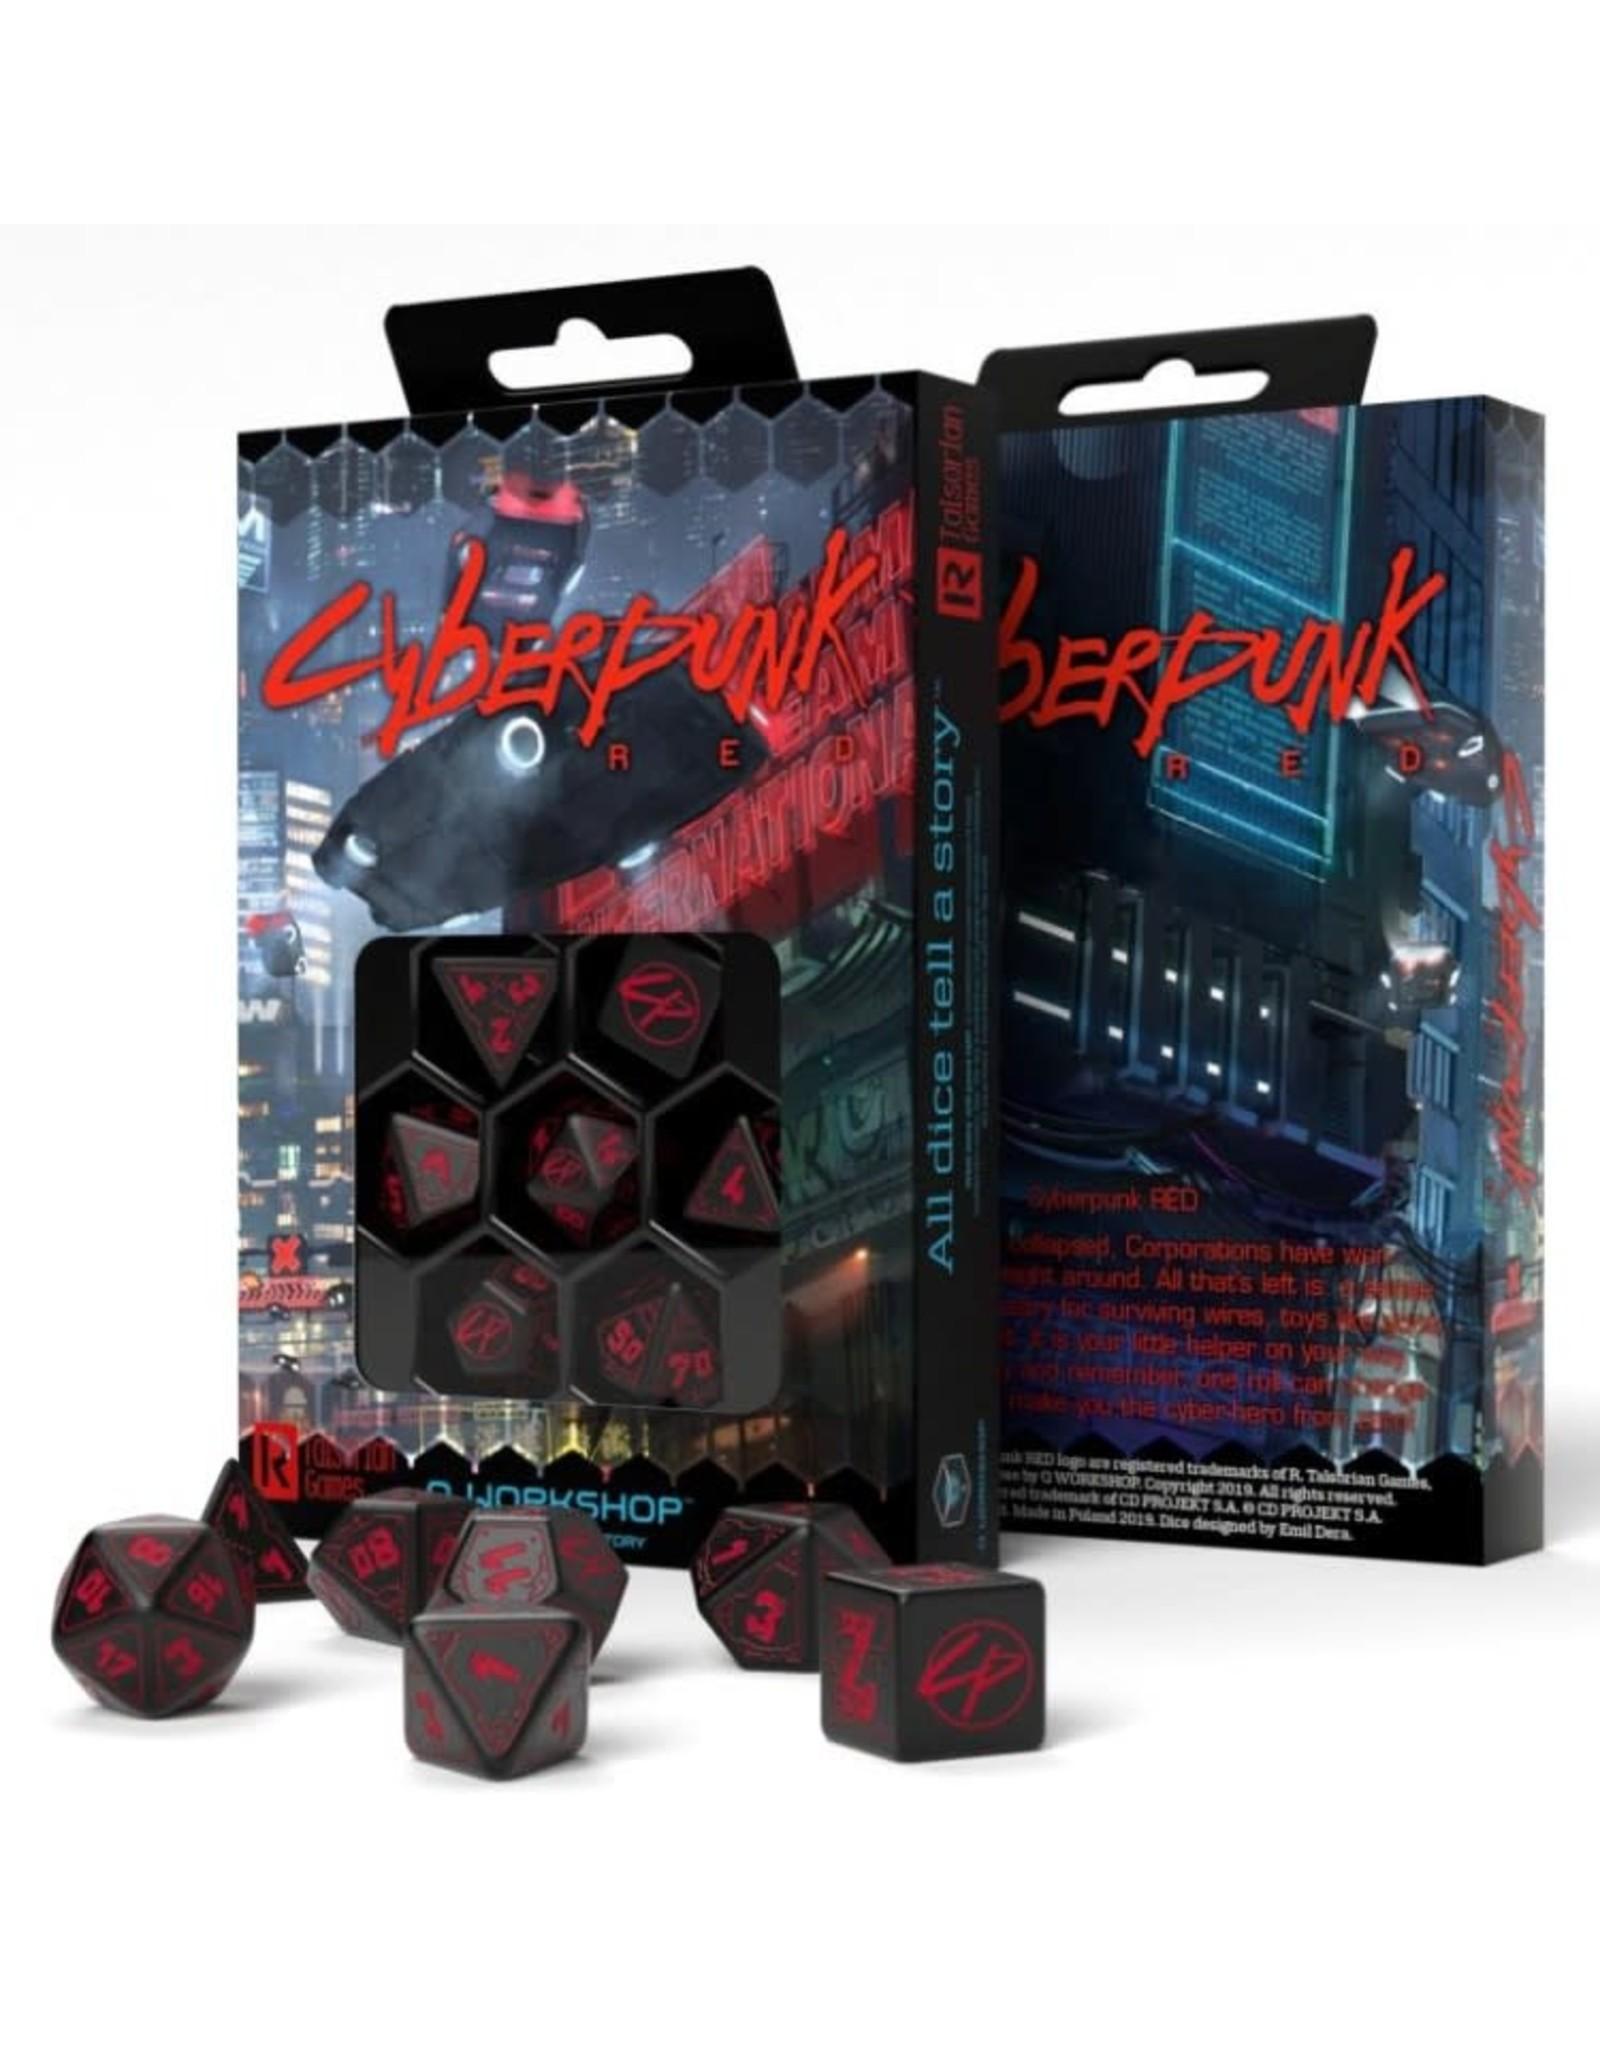 Q-Workshop 7-set Cyberpunk PRG